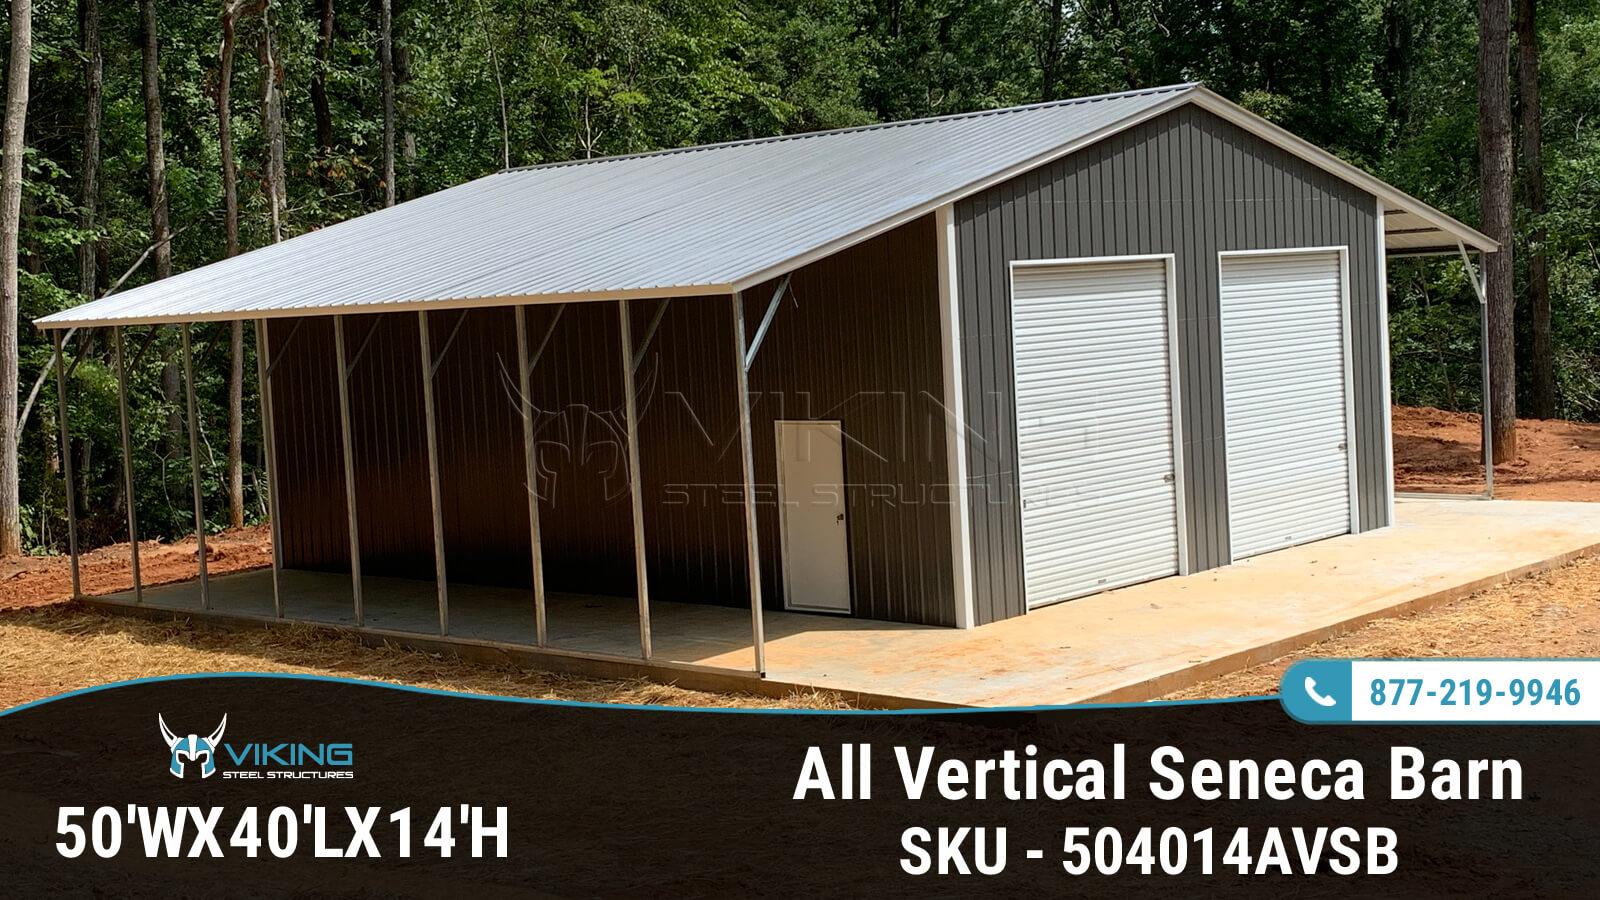 50'x40'x14' All Vertical Seneca Barn